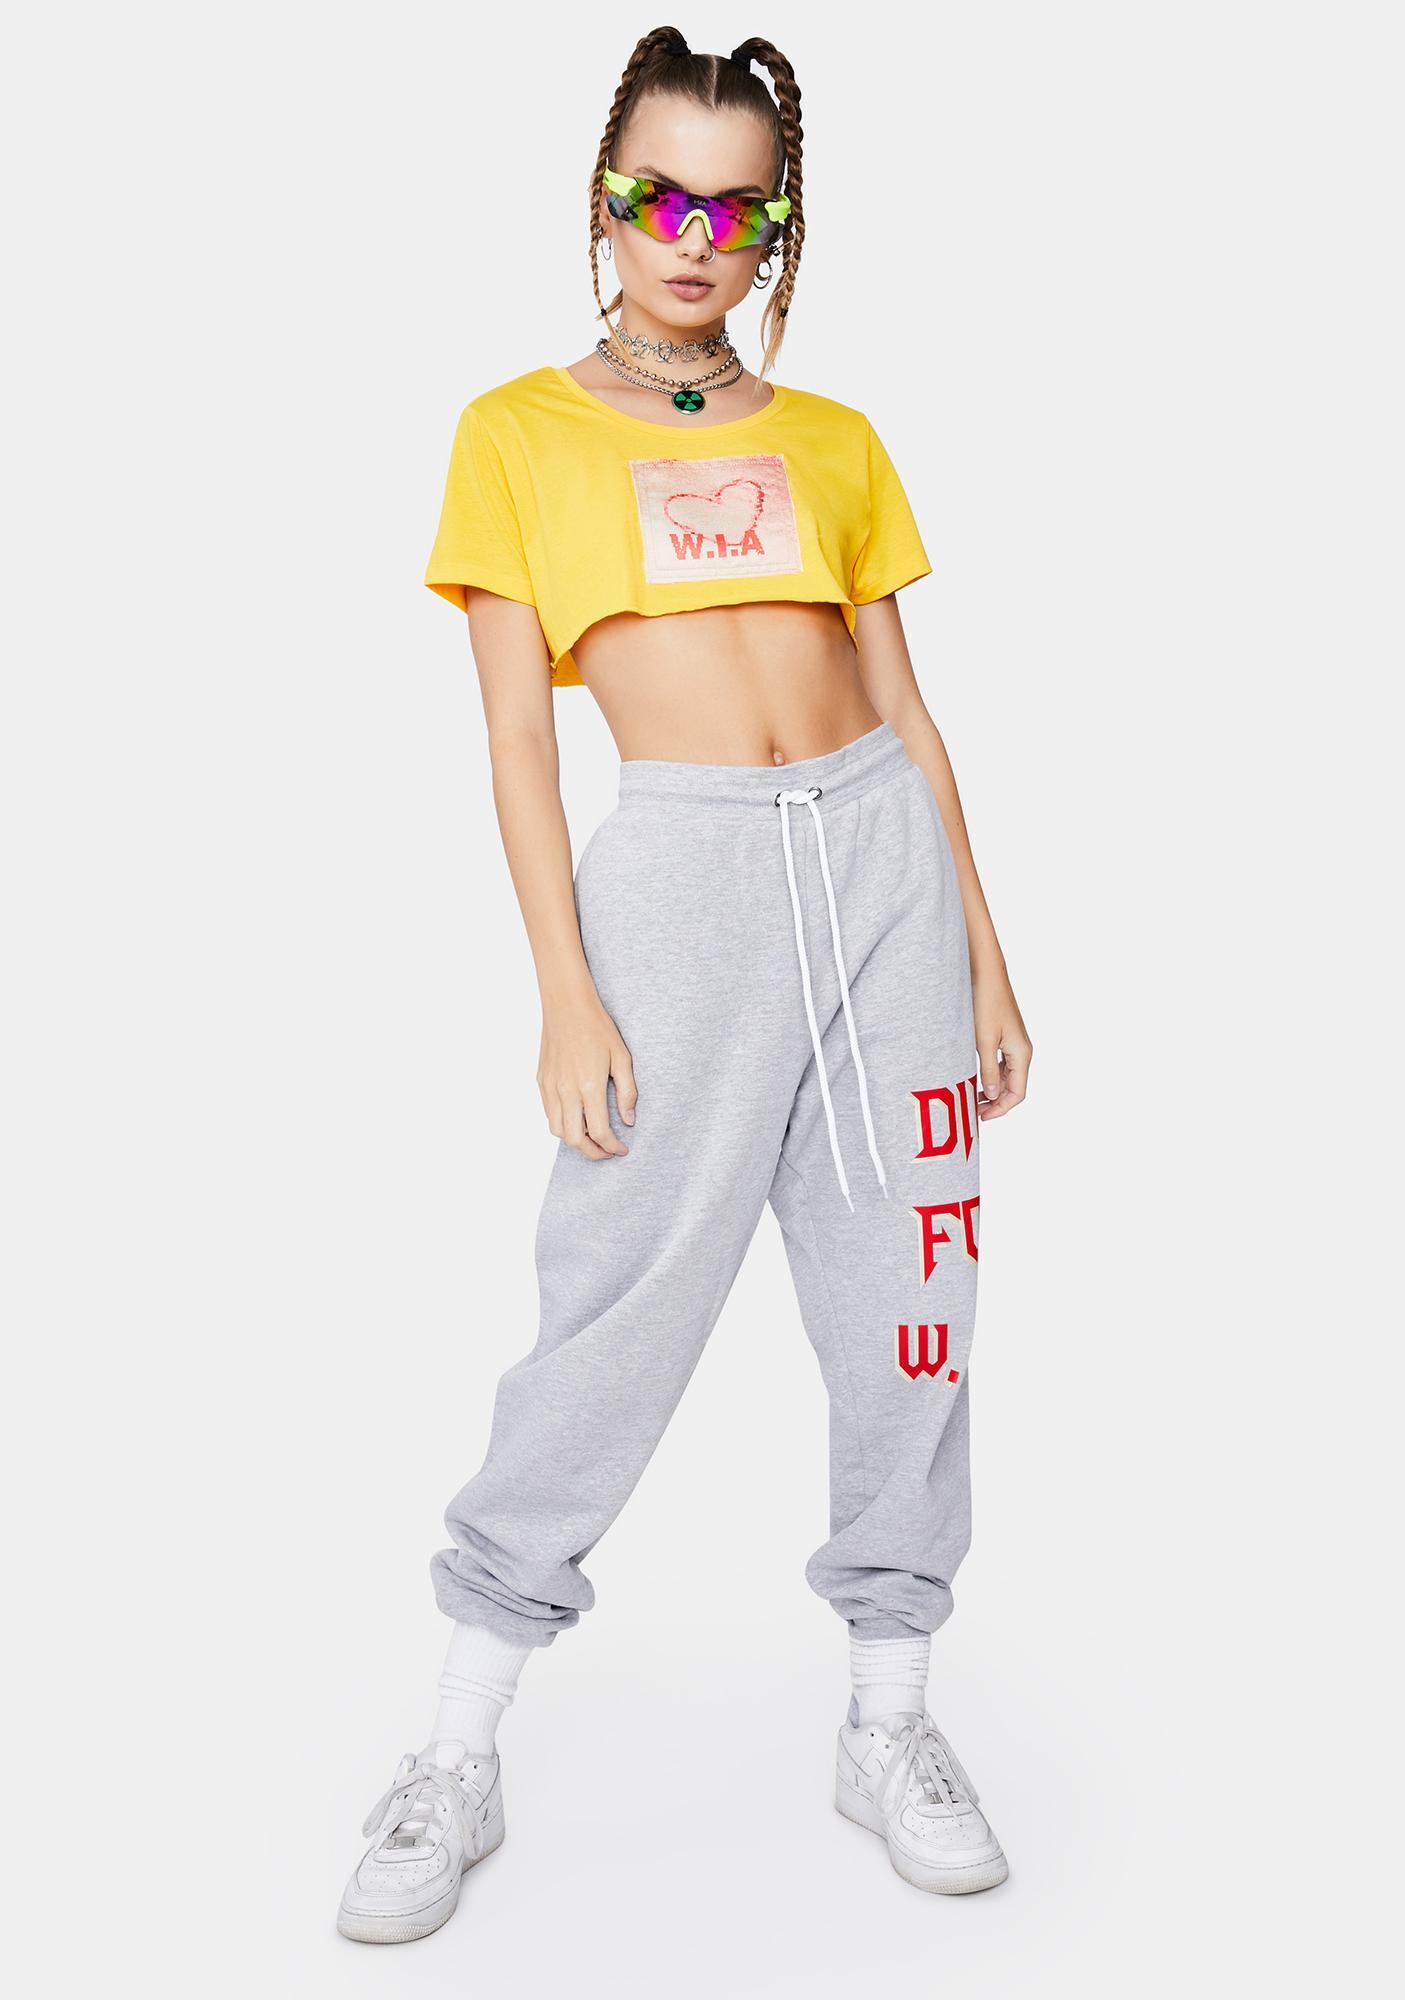 W.I.A Die For W.I.A Sweatpants